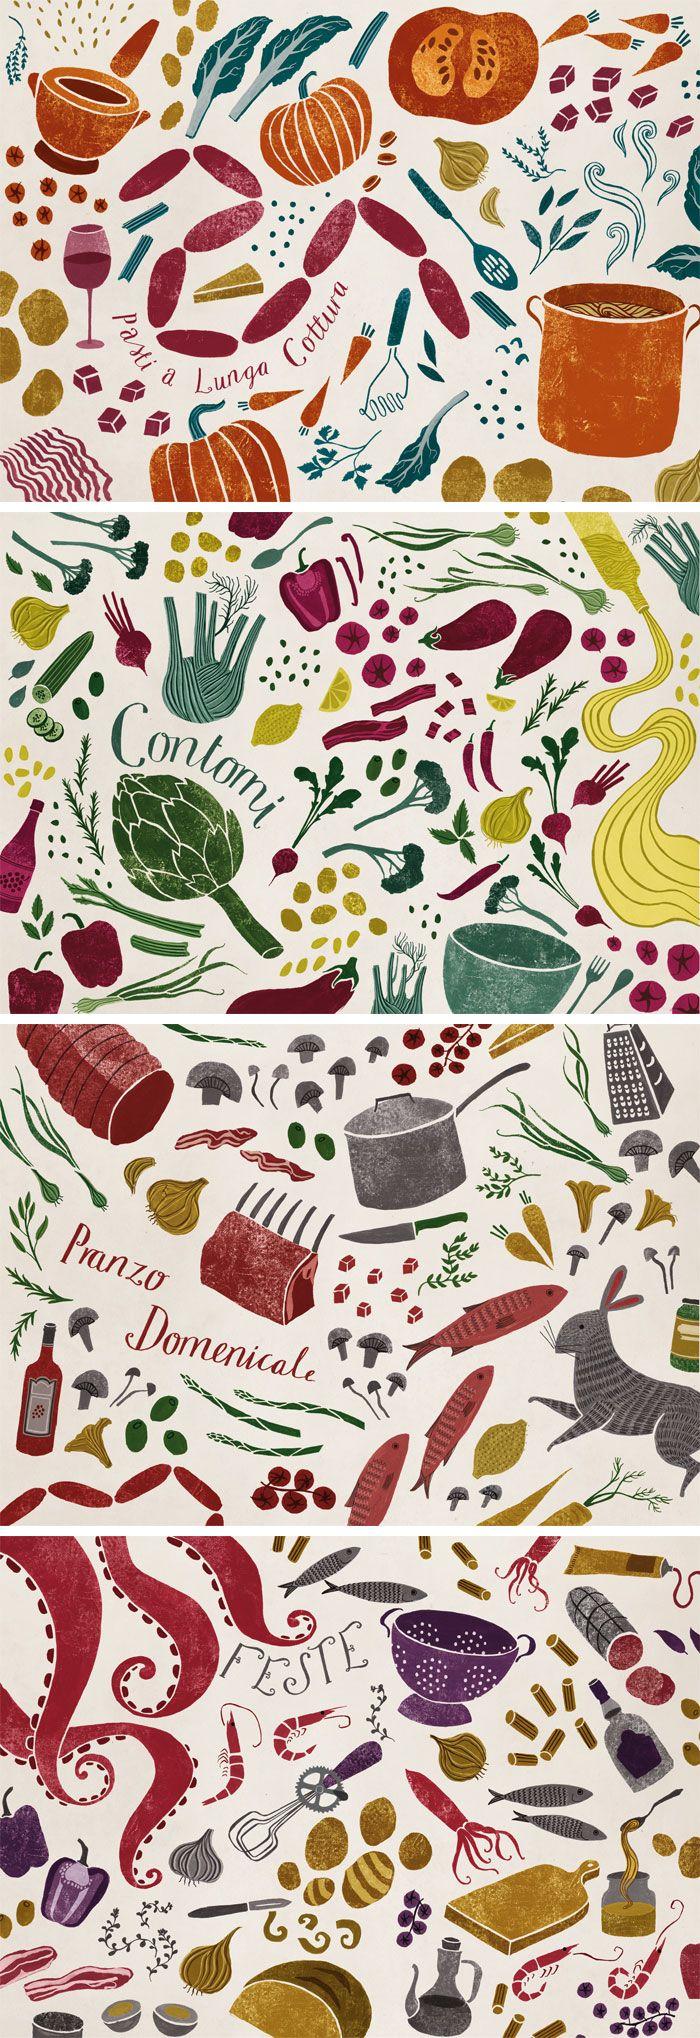 Food illustrations for Gennaro Contaldo by Sara Mulvanny